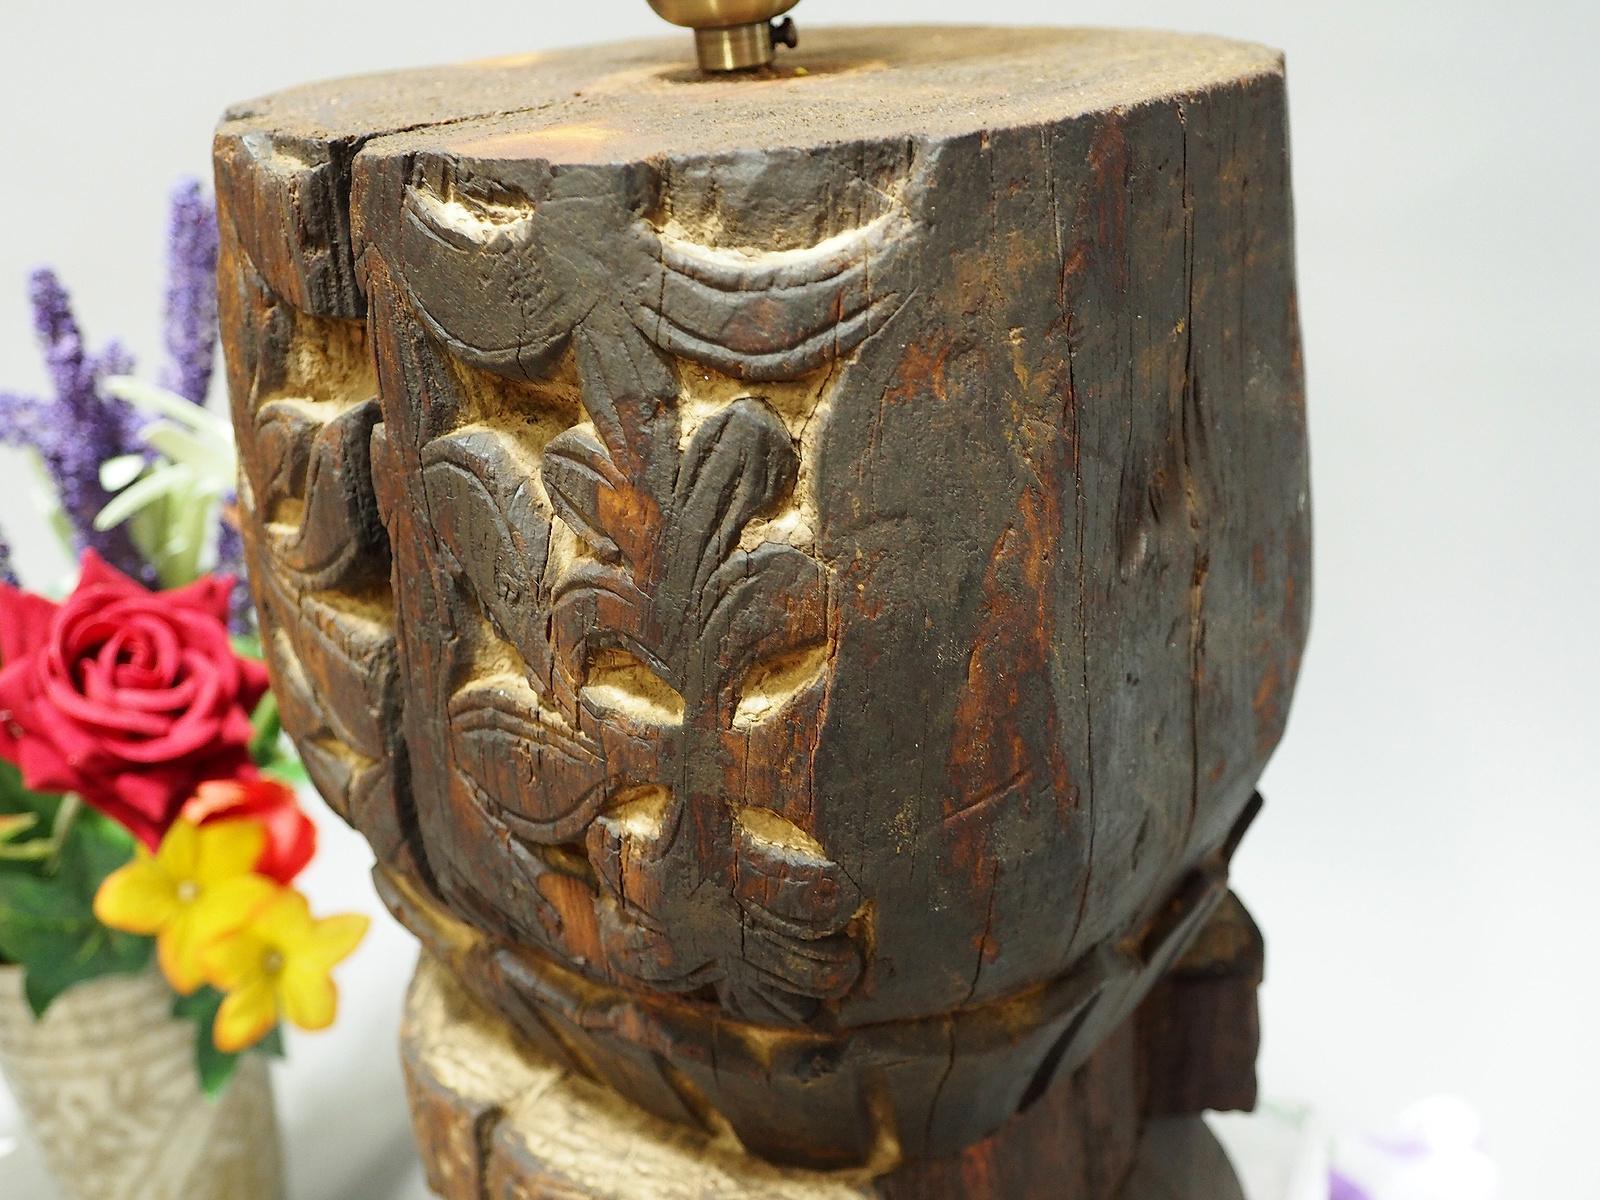 islamische antike orient massiv Holz Lampenfuß Lampensockel aus Nuristan Afghanistan Swat-tall pakistan NU1